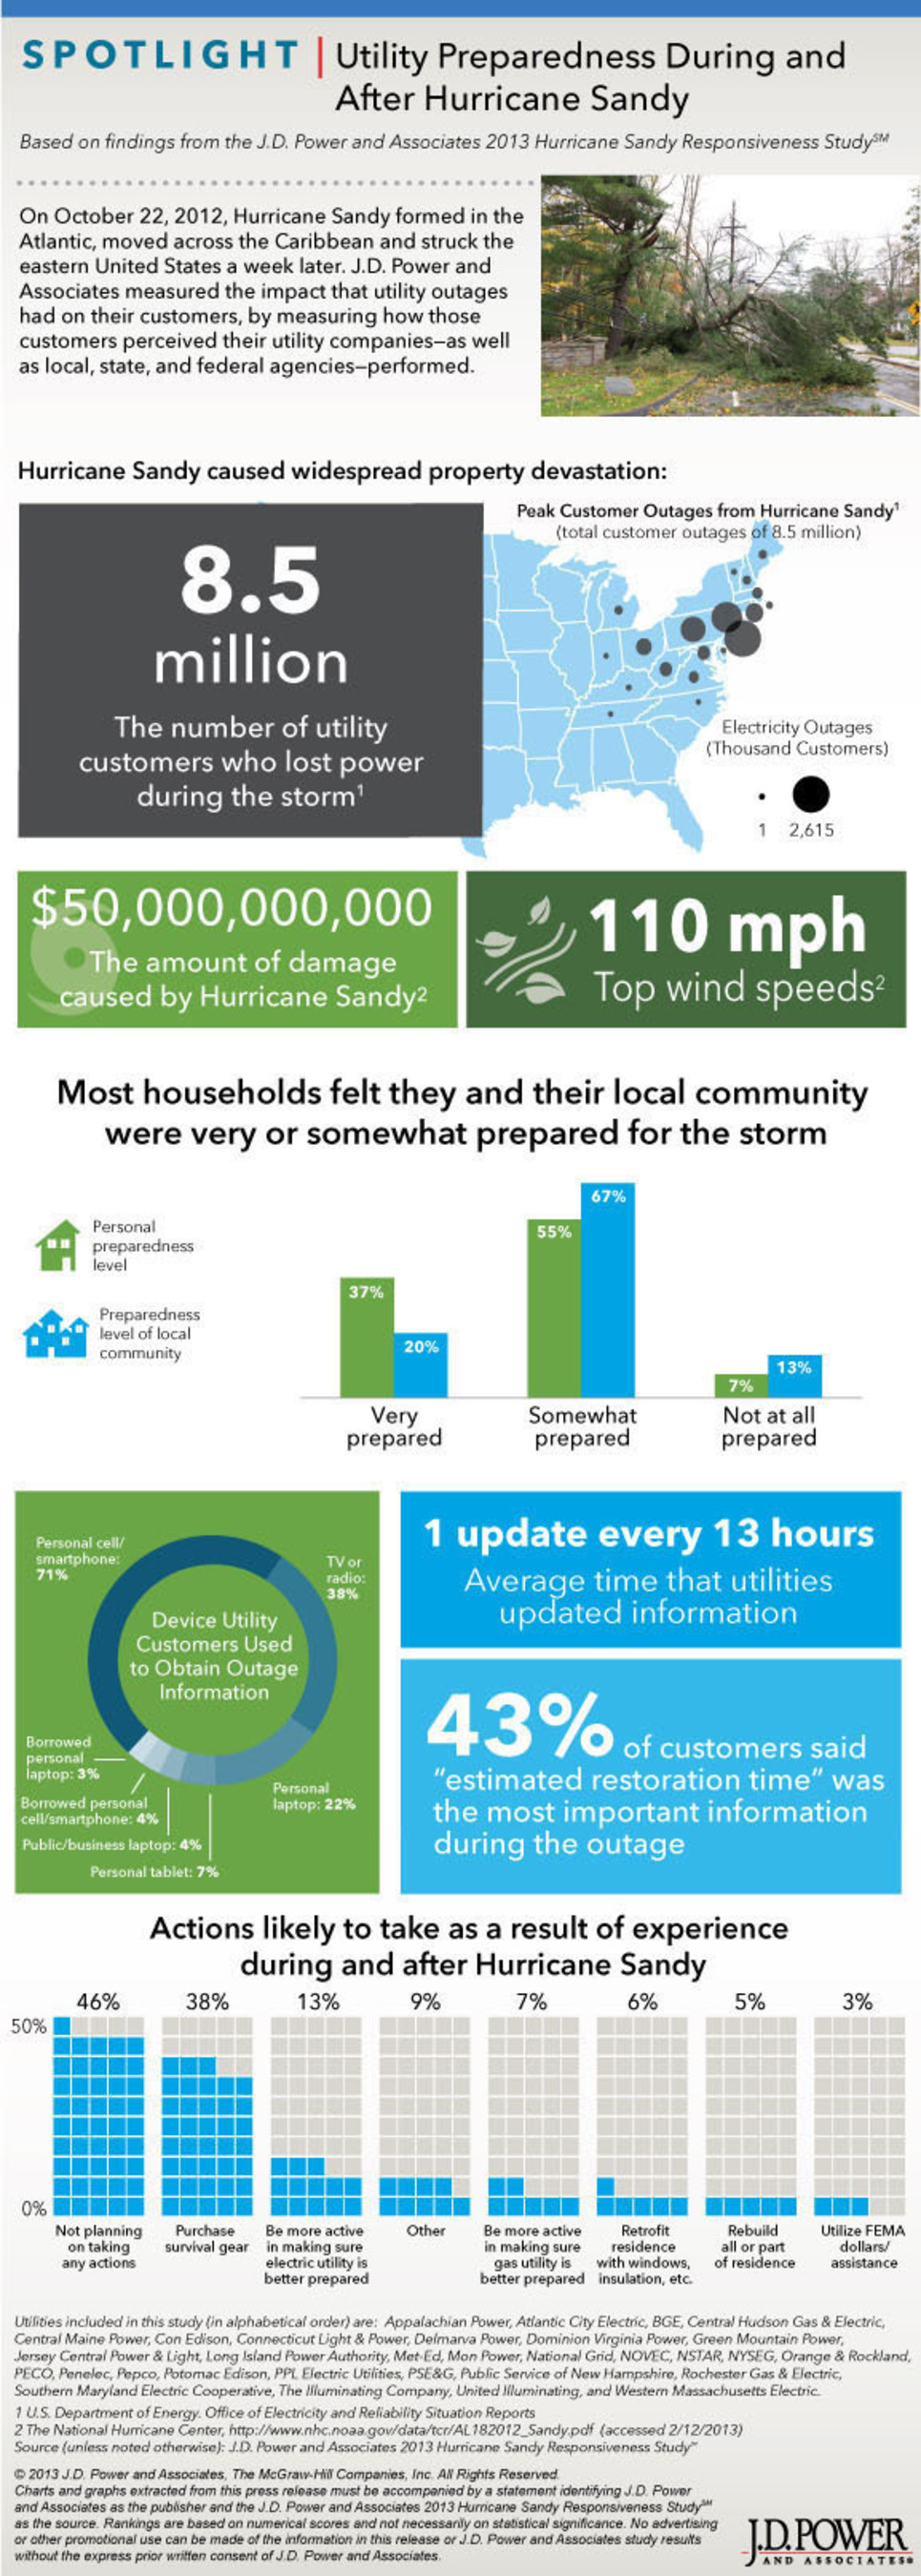 Utility Preparedness During and After Hurricane Sandy. (PRNewsFoto/J.D. Power and Associates) (PRNewsFoto/J.D. ...